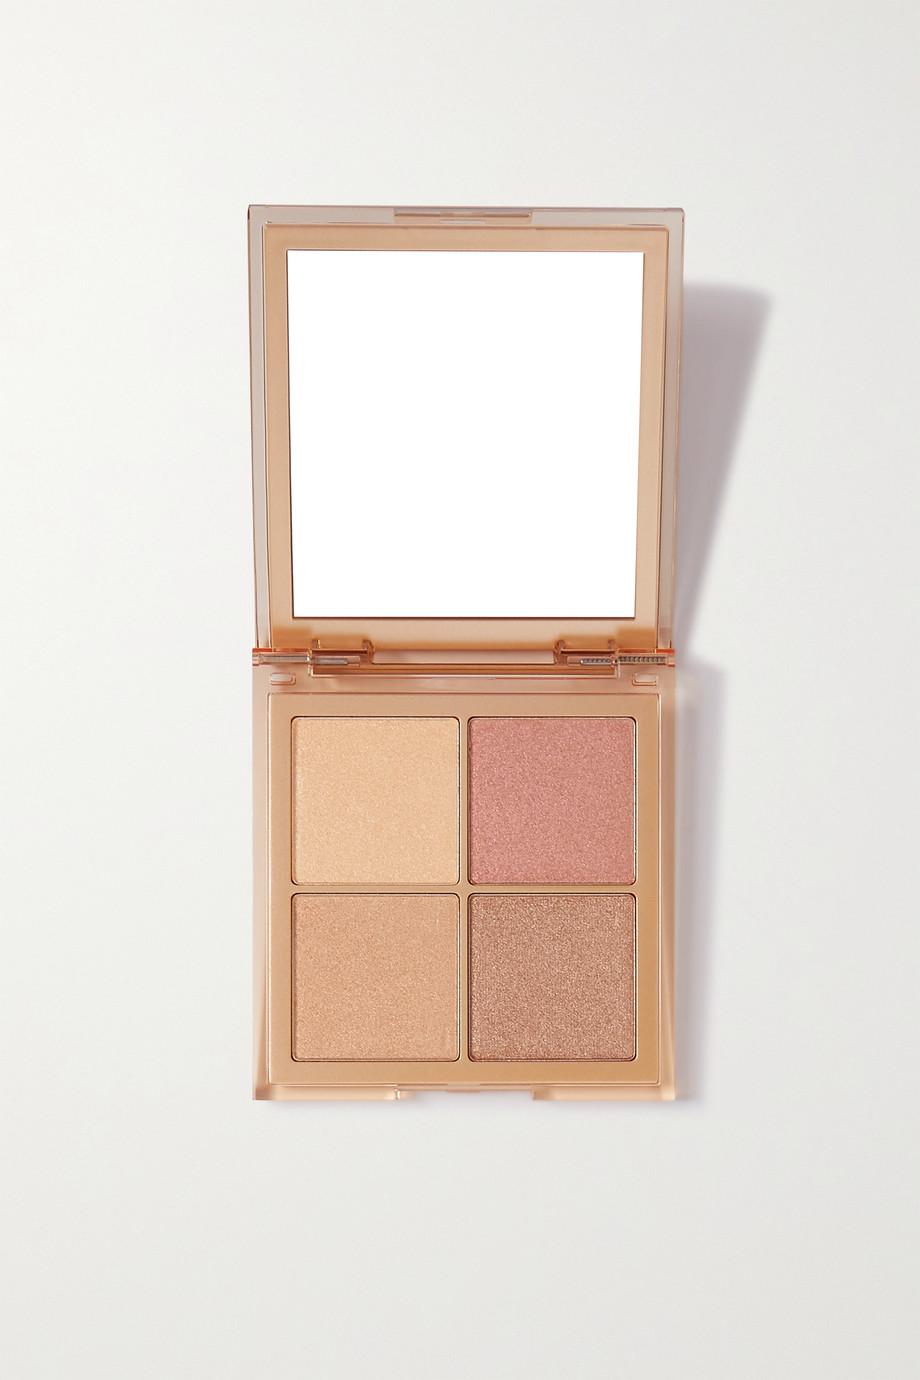 Huda Beauty Glow Obsessions Highlighter Palette - Medium